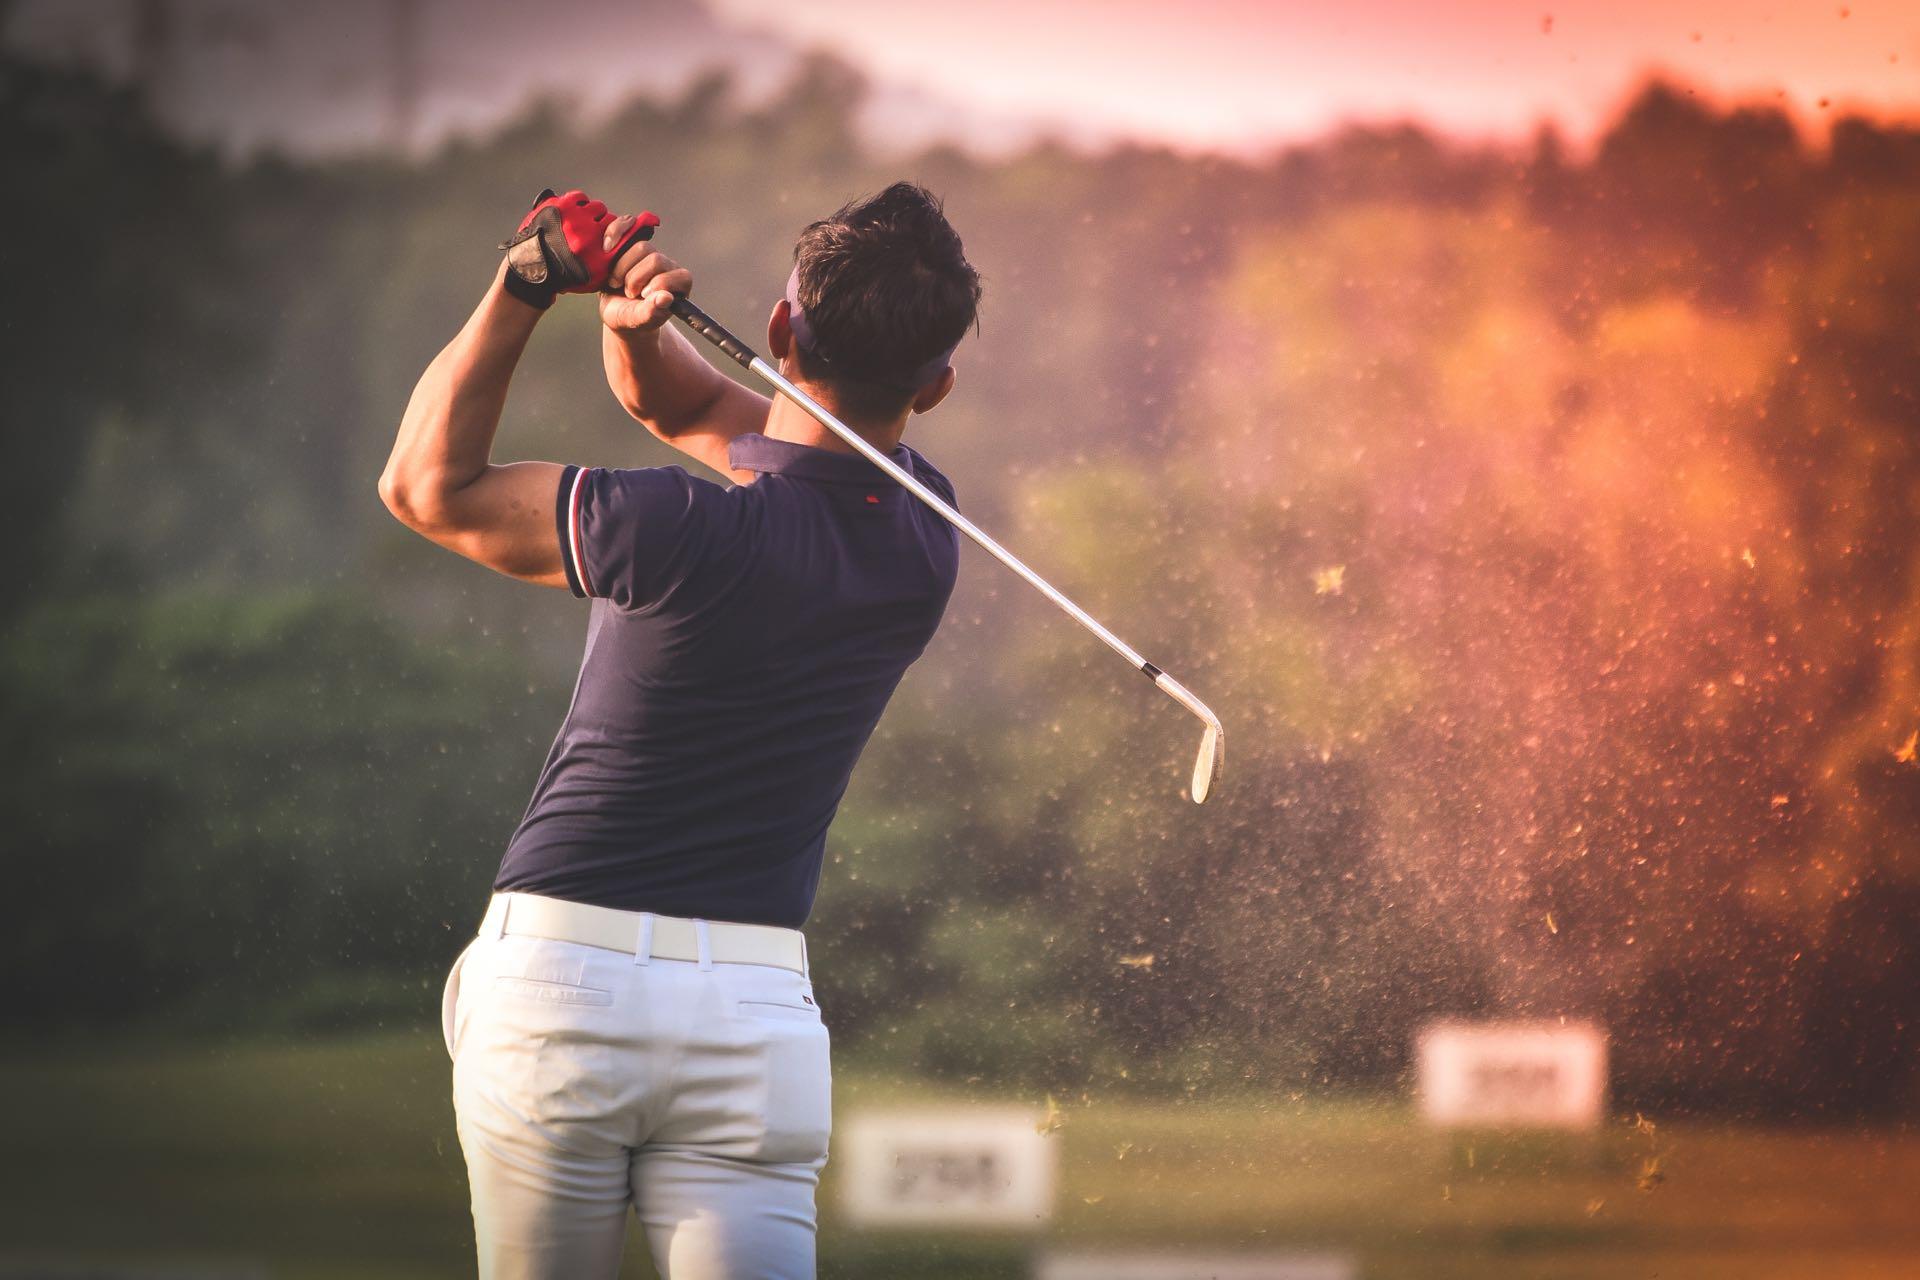 Golfer hitting golf shot with club on course